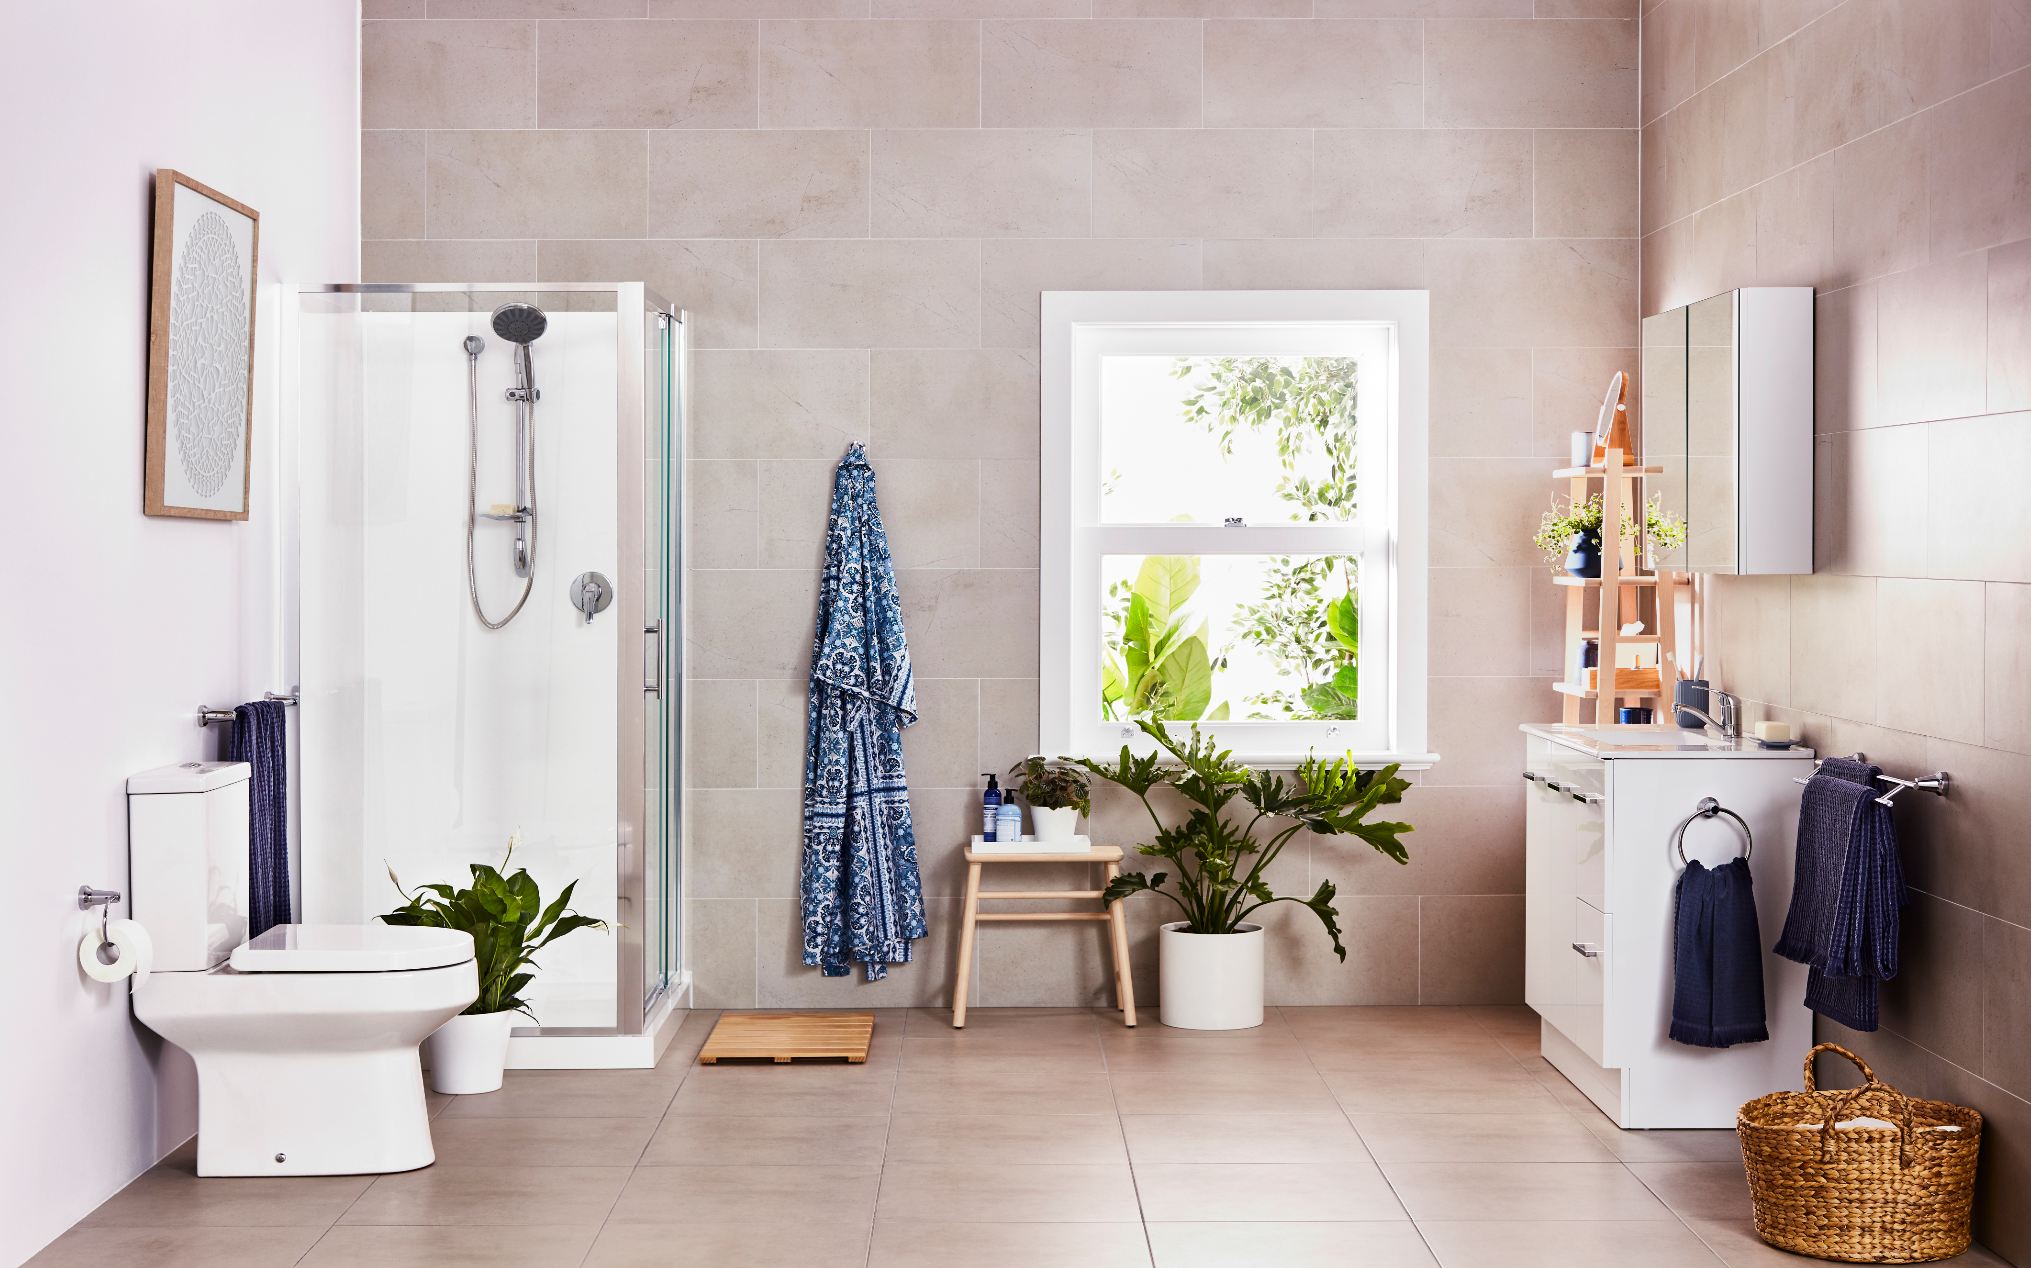 Timeless Bathroom Design Featuring The Cadenza Range From Mondella Bunnings Bunningsbathroom Bathroom Bathroom Style Timeless Bathroom Bathroom Design